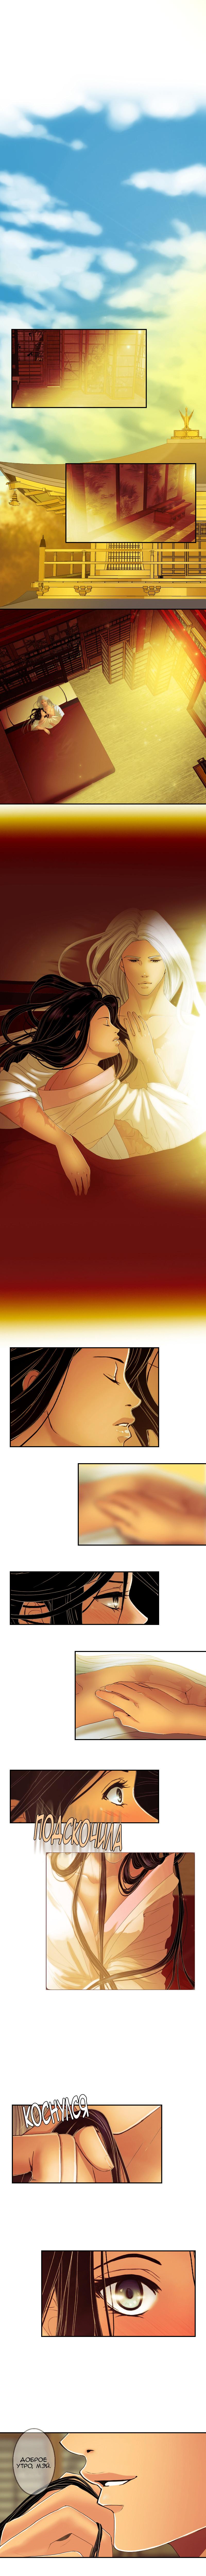 https://r1.ninemanga.com/comics/pic2/50/32242/336938/1510164408951.jpg Page 1